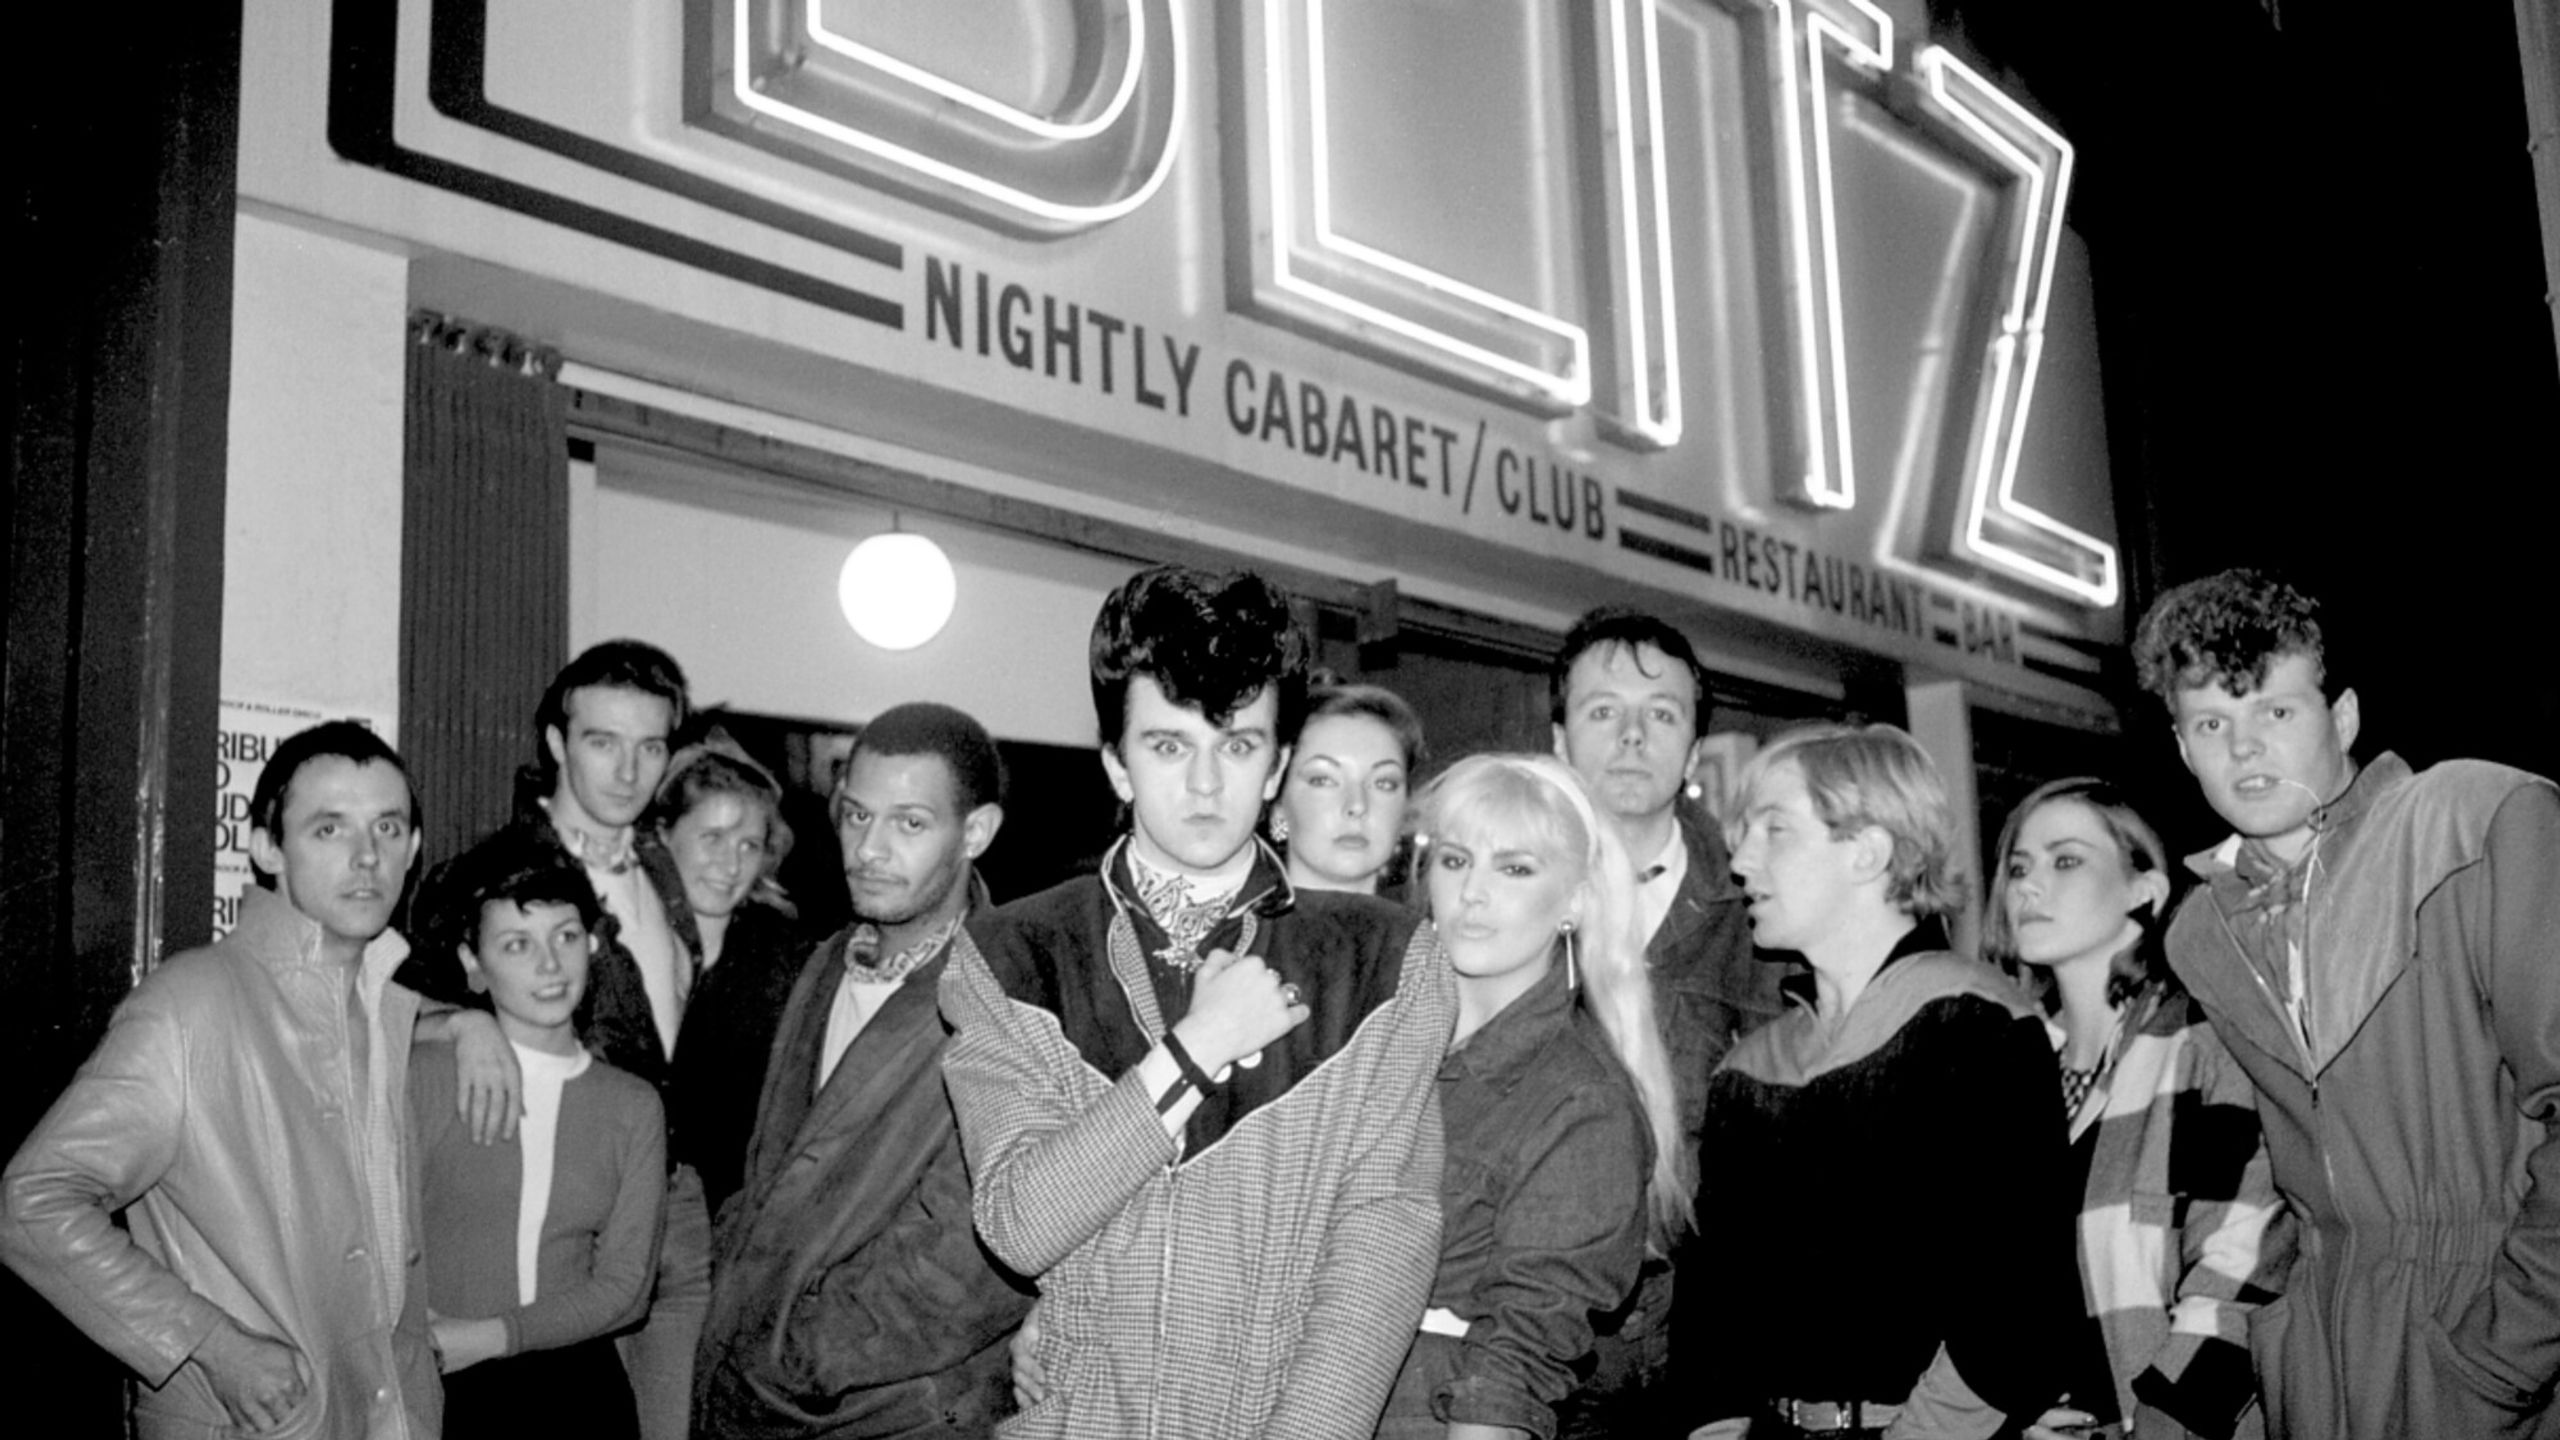 Club Blitz en de stijliconen van de 80's